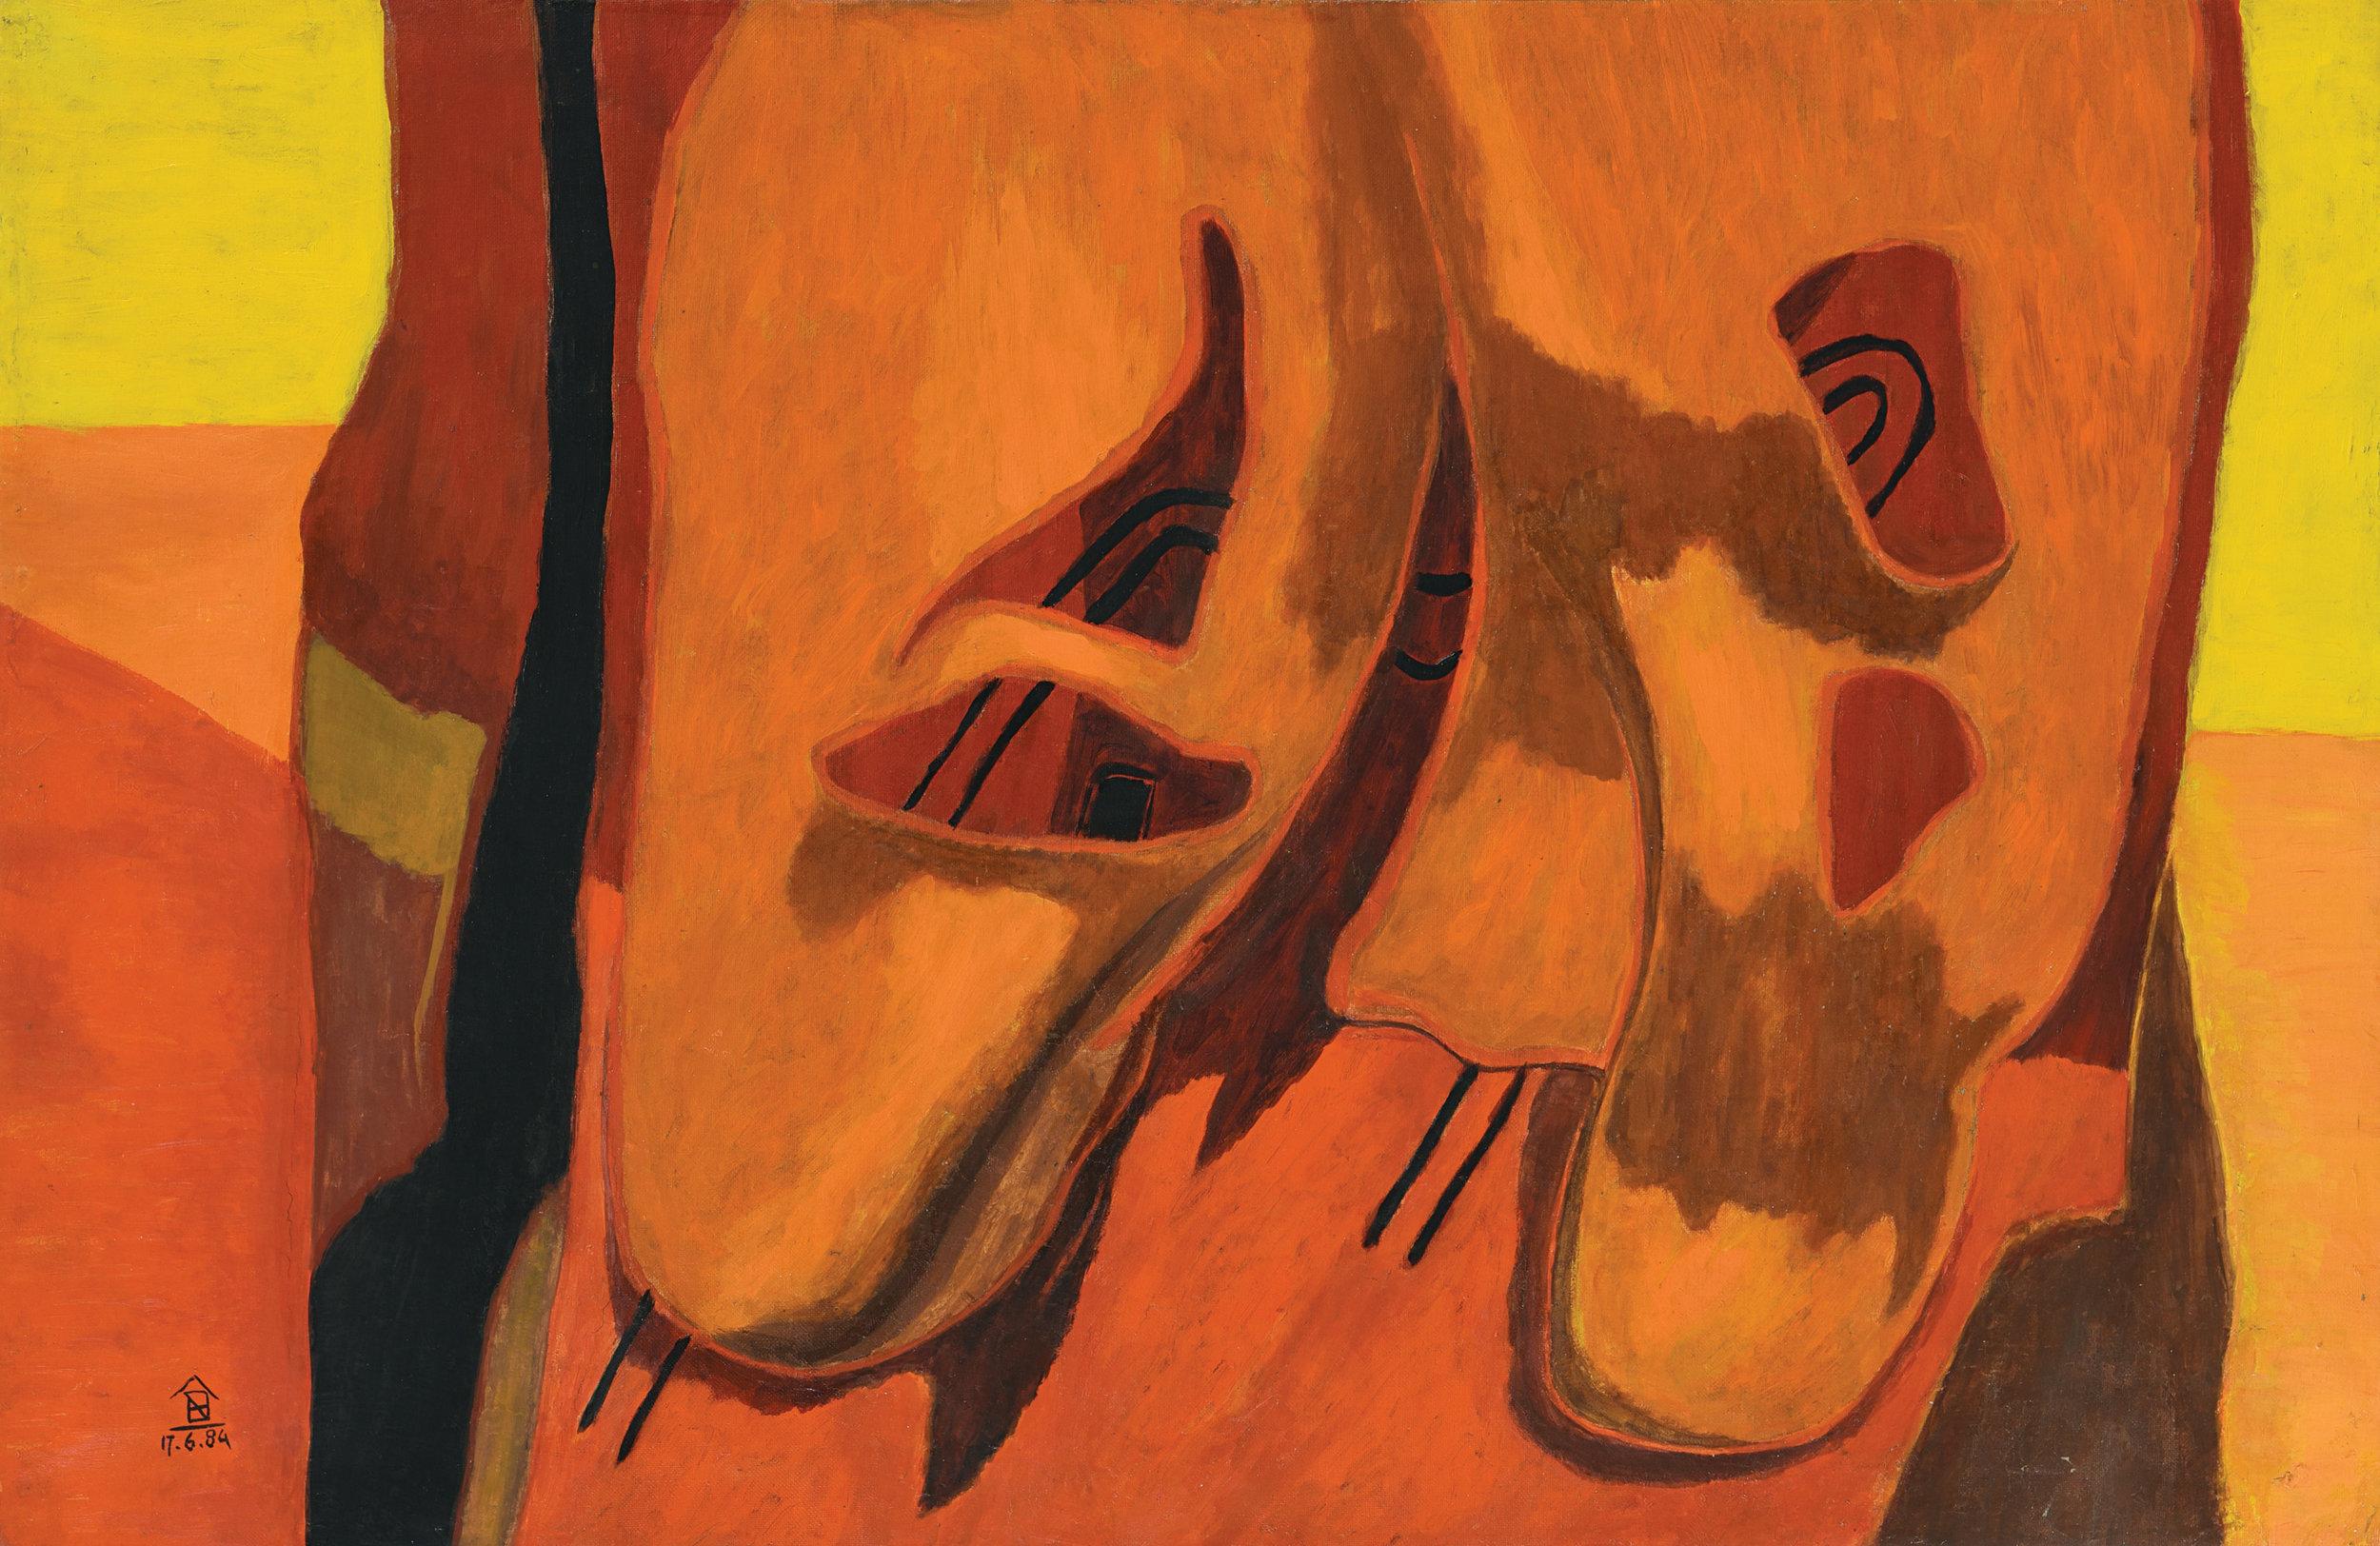 Nashar, Untitled, oil on canvas, 64 x 98 cm, 1984